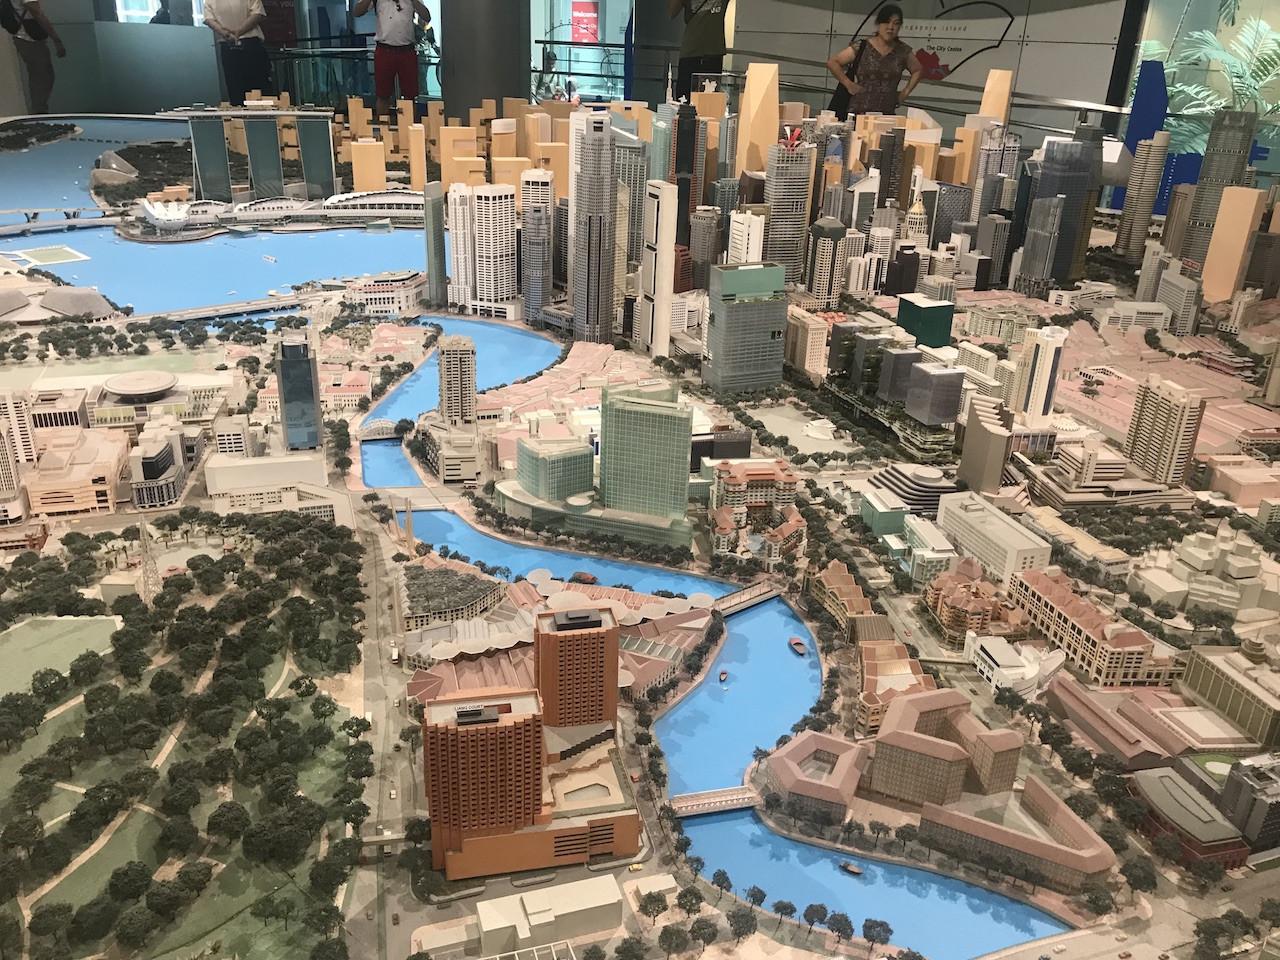 Digging deep: Singapore plans an underground future